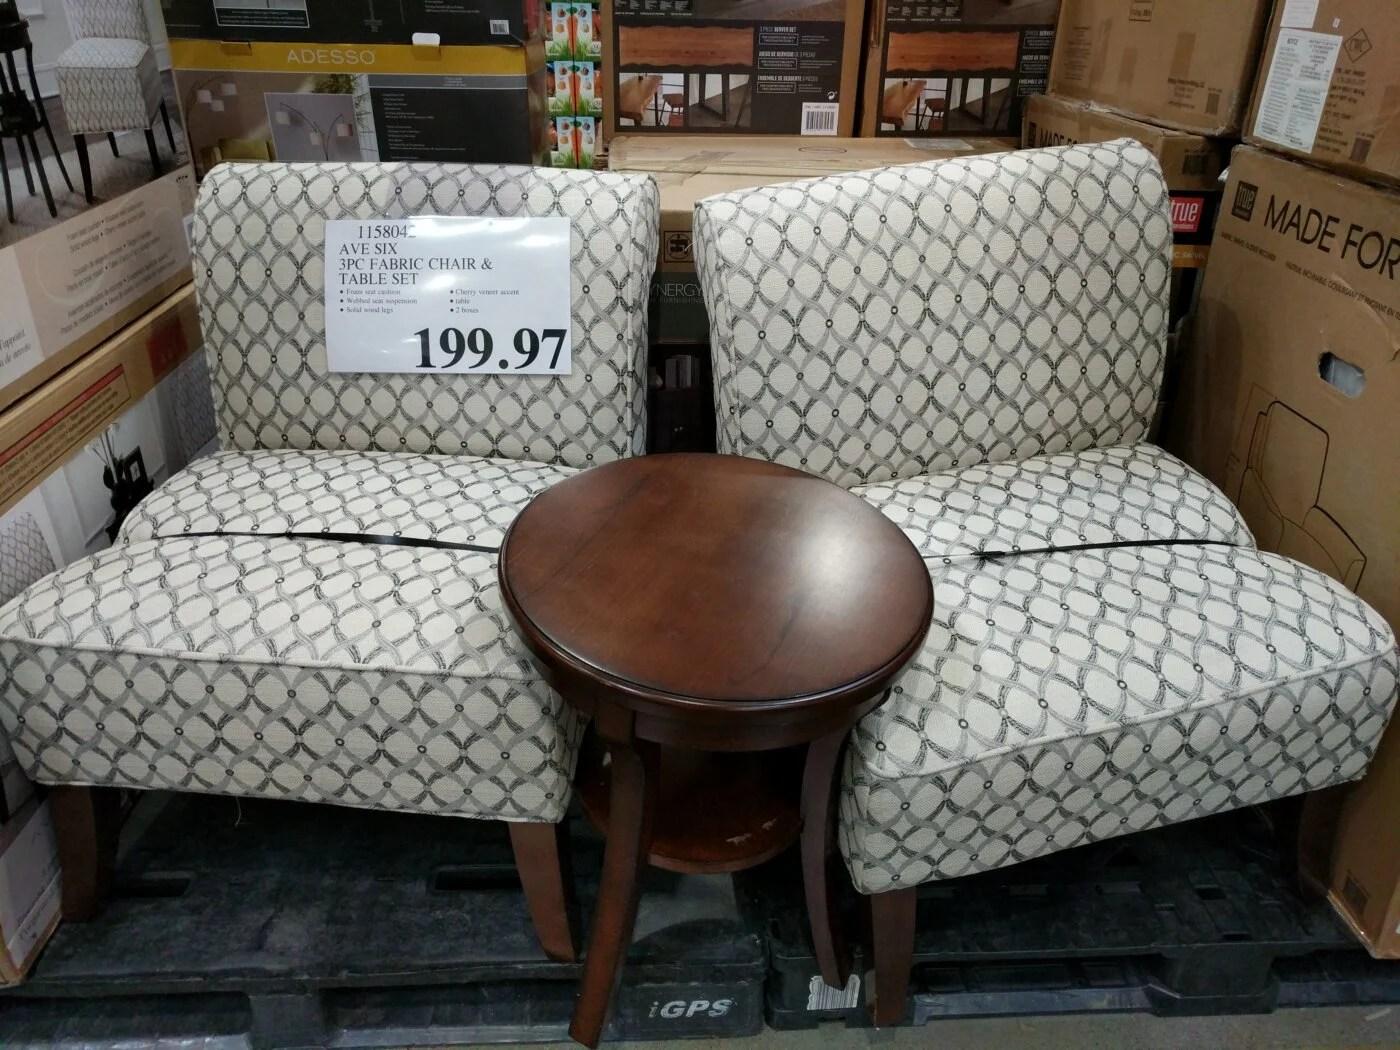 Avenue Six 3 Piece Fabric Chair U0026 Table Set